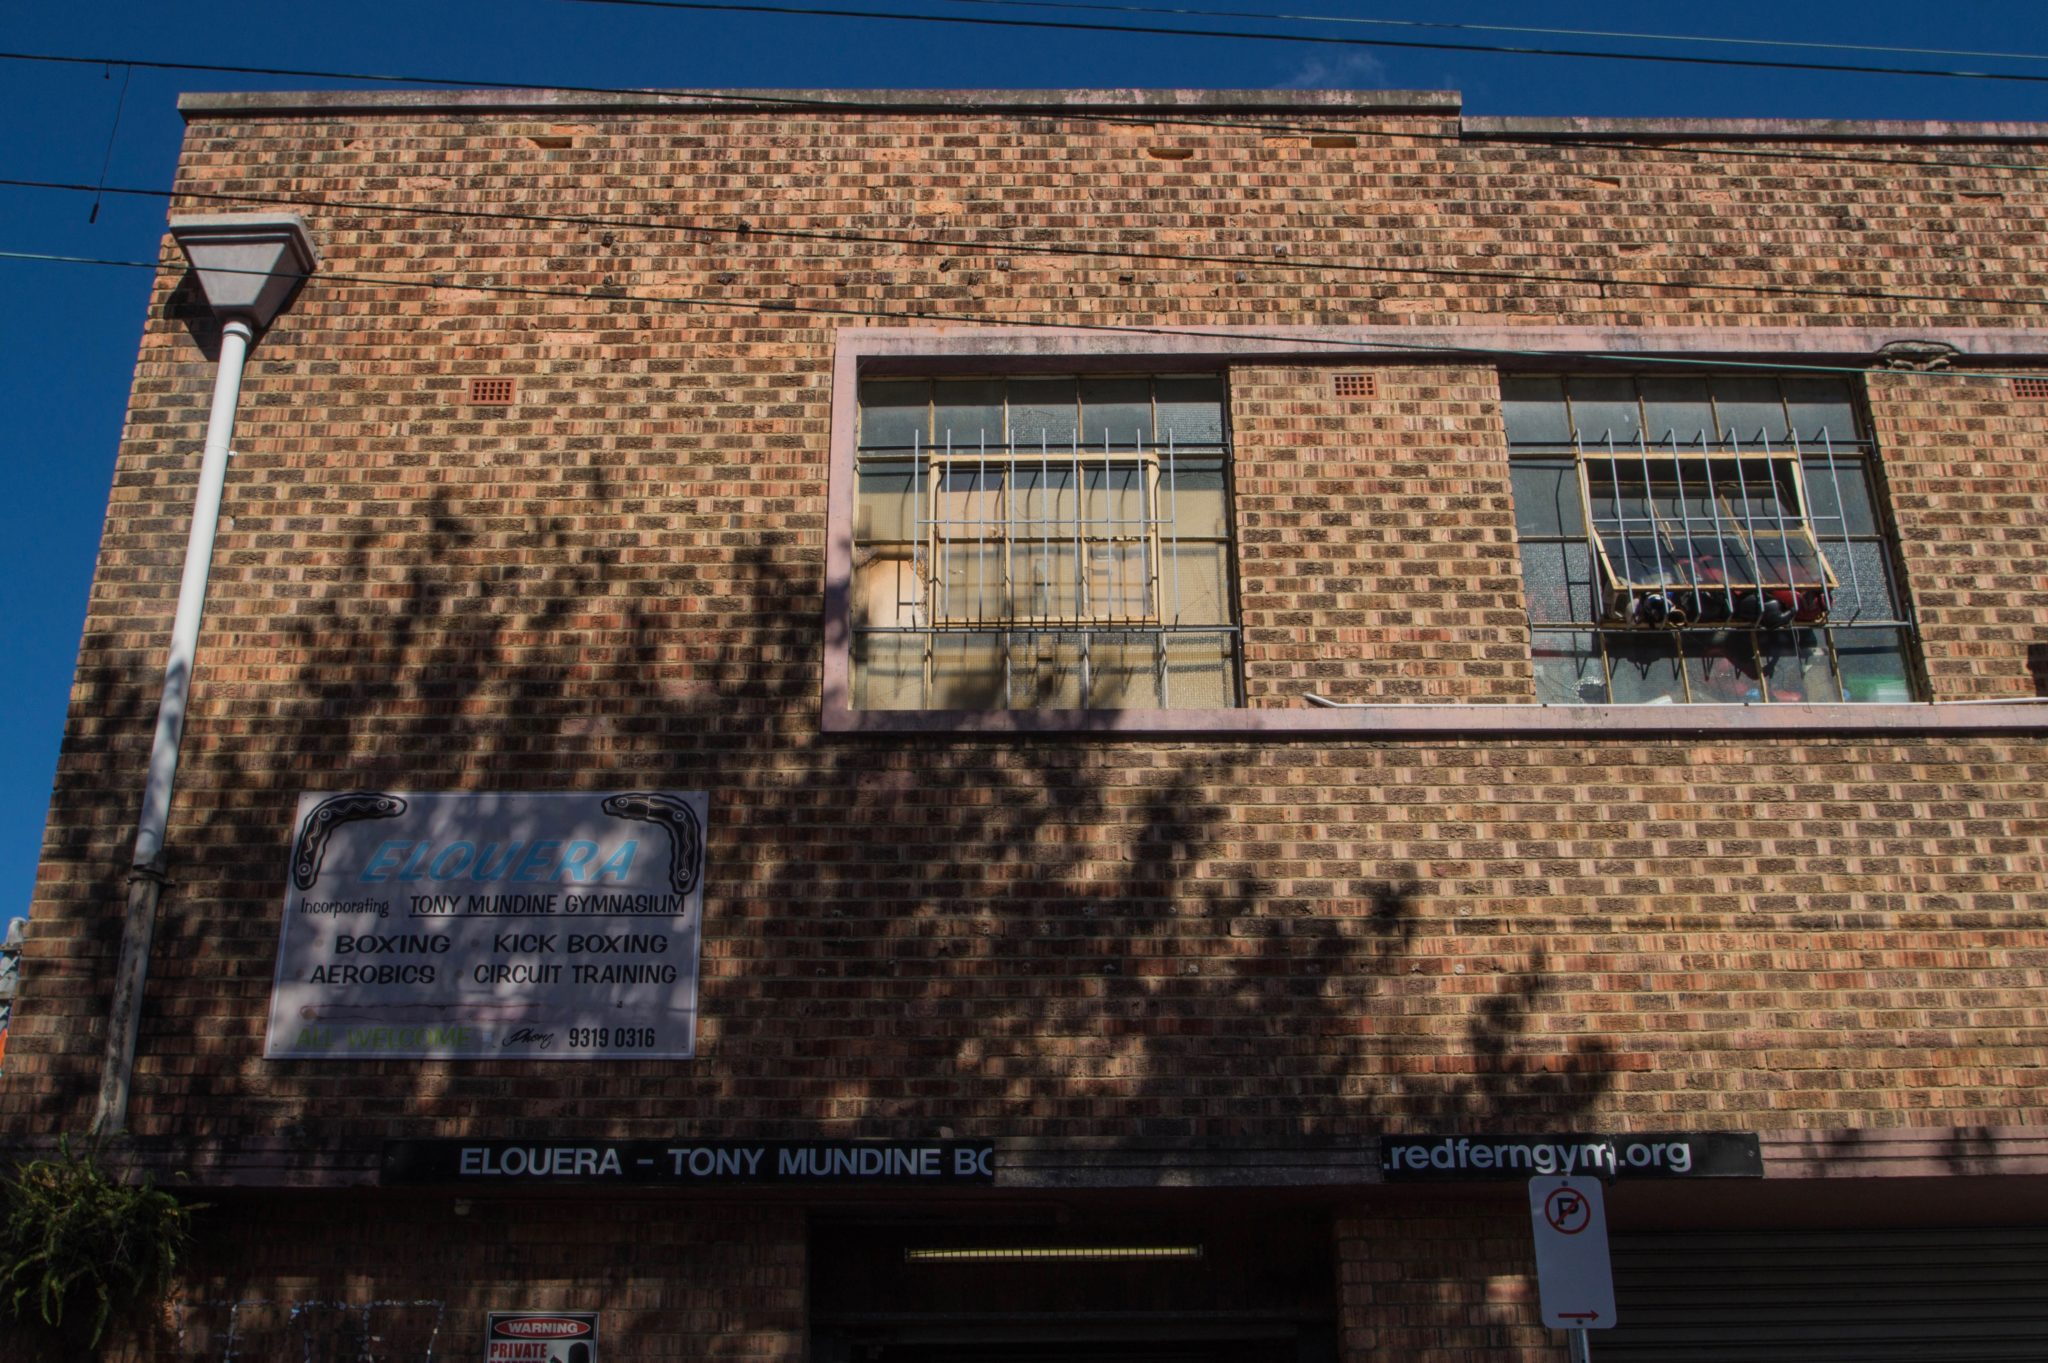 Redfern Sydney: Tony Mundines Boxschule hat heute geschlossen